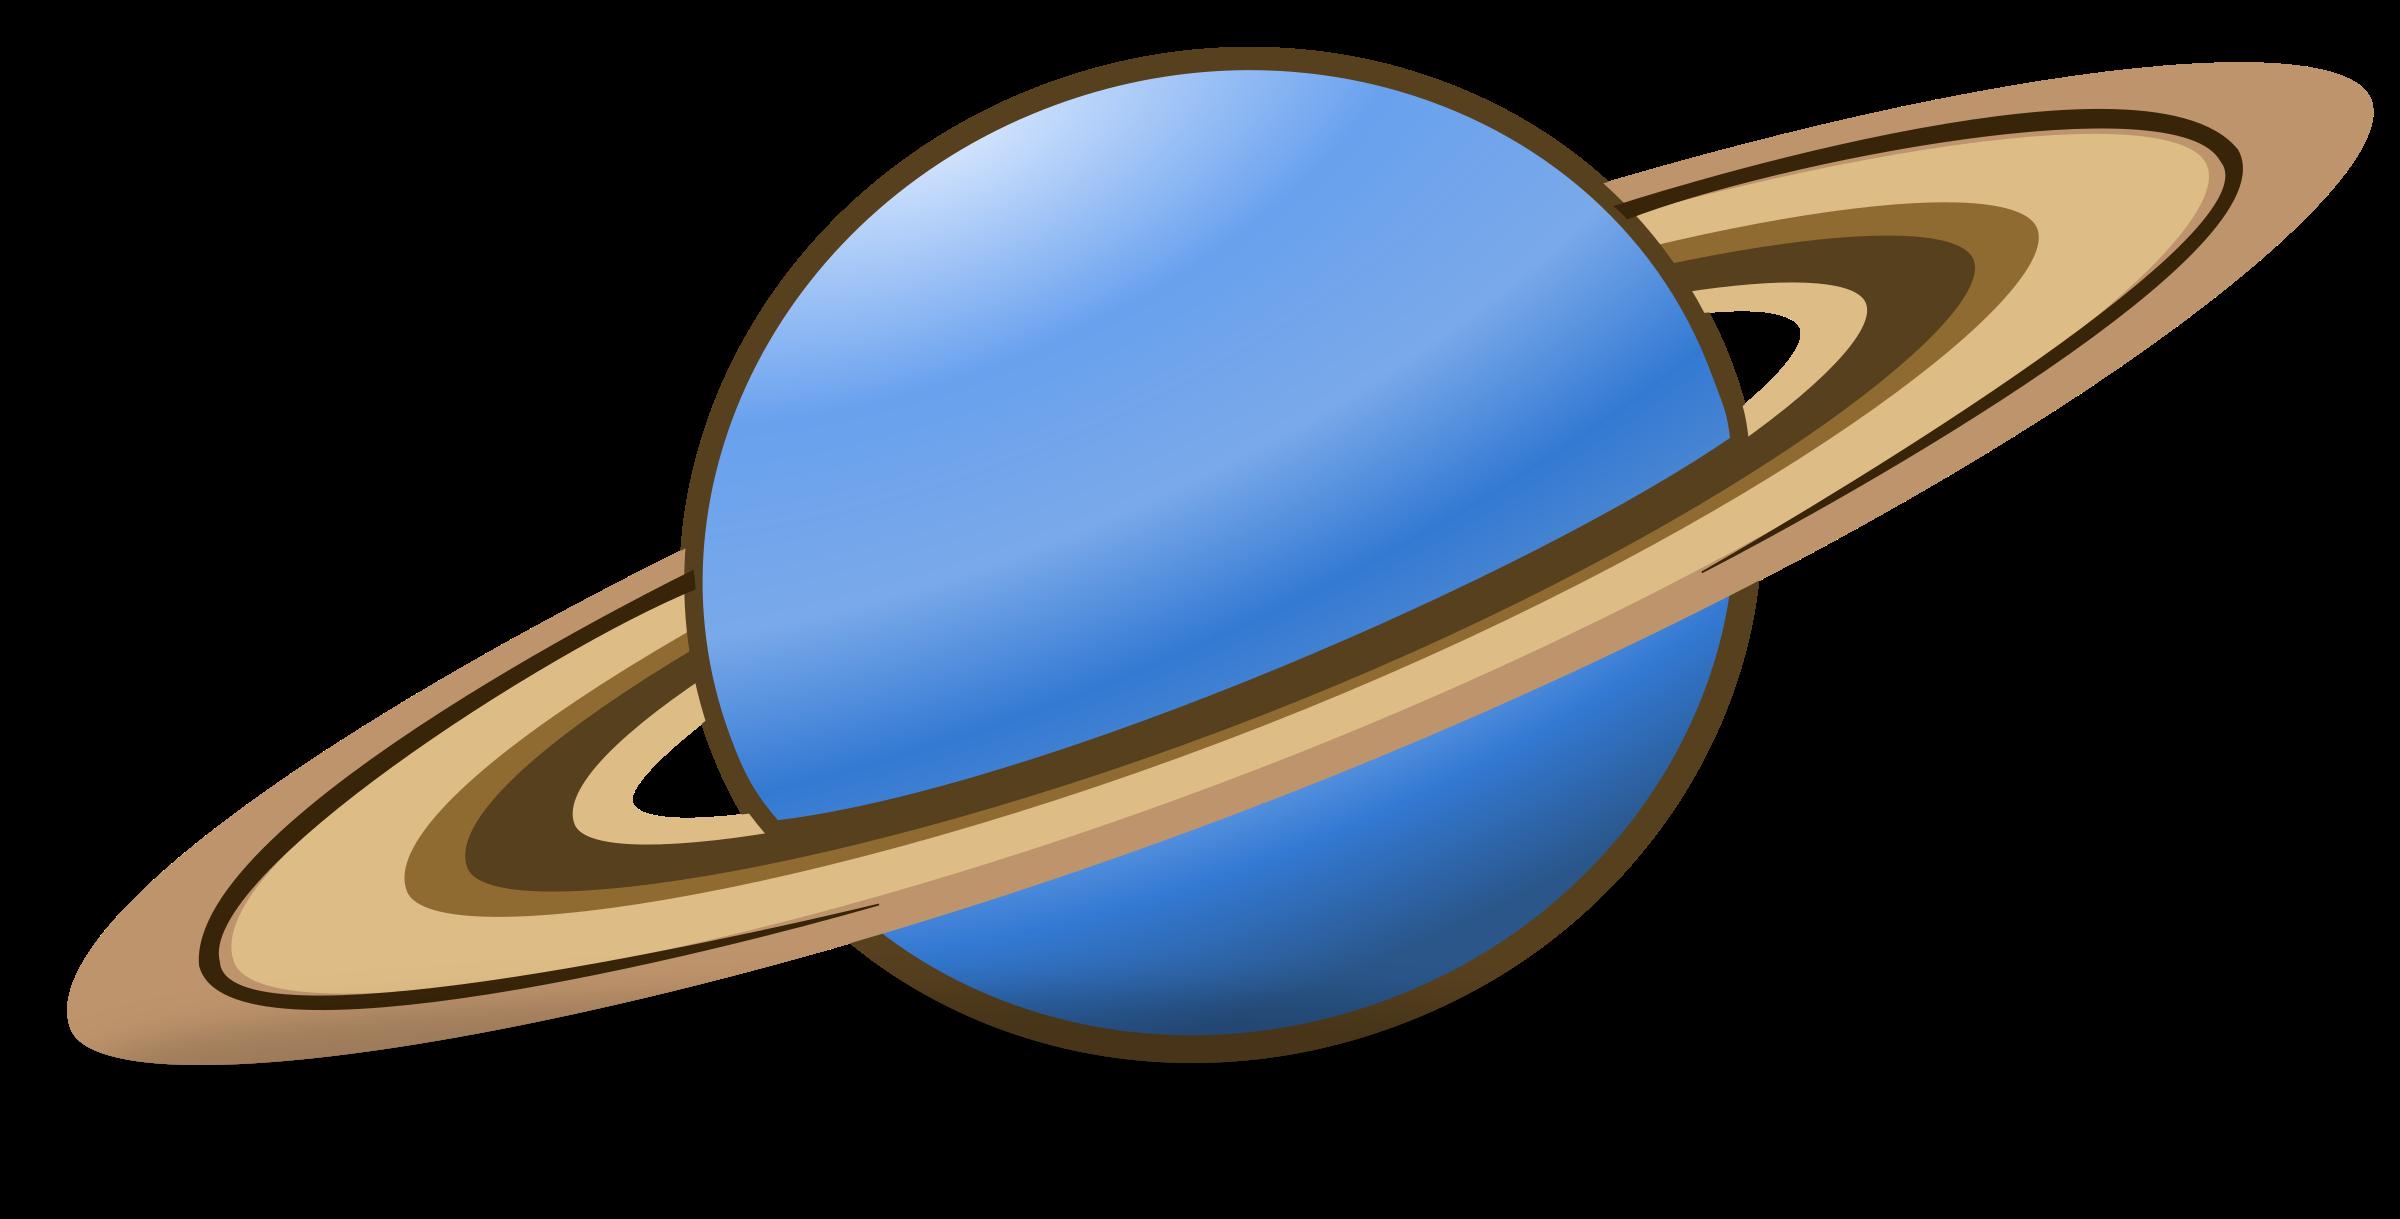 Frames illustrations hd images. Planeten clipart saturn